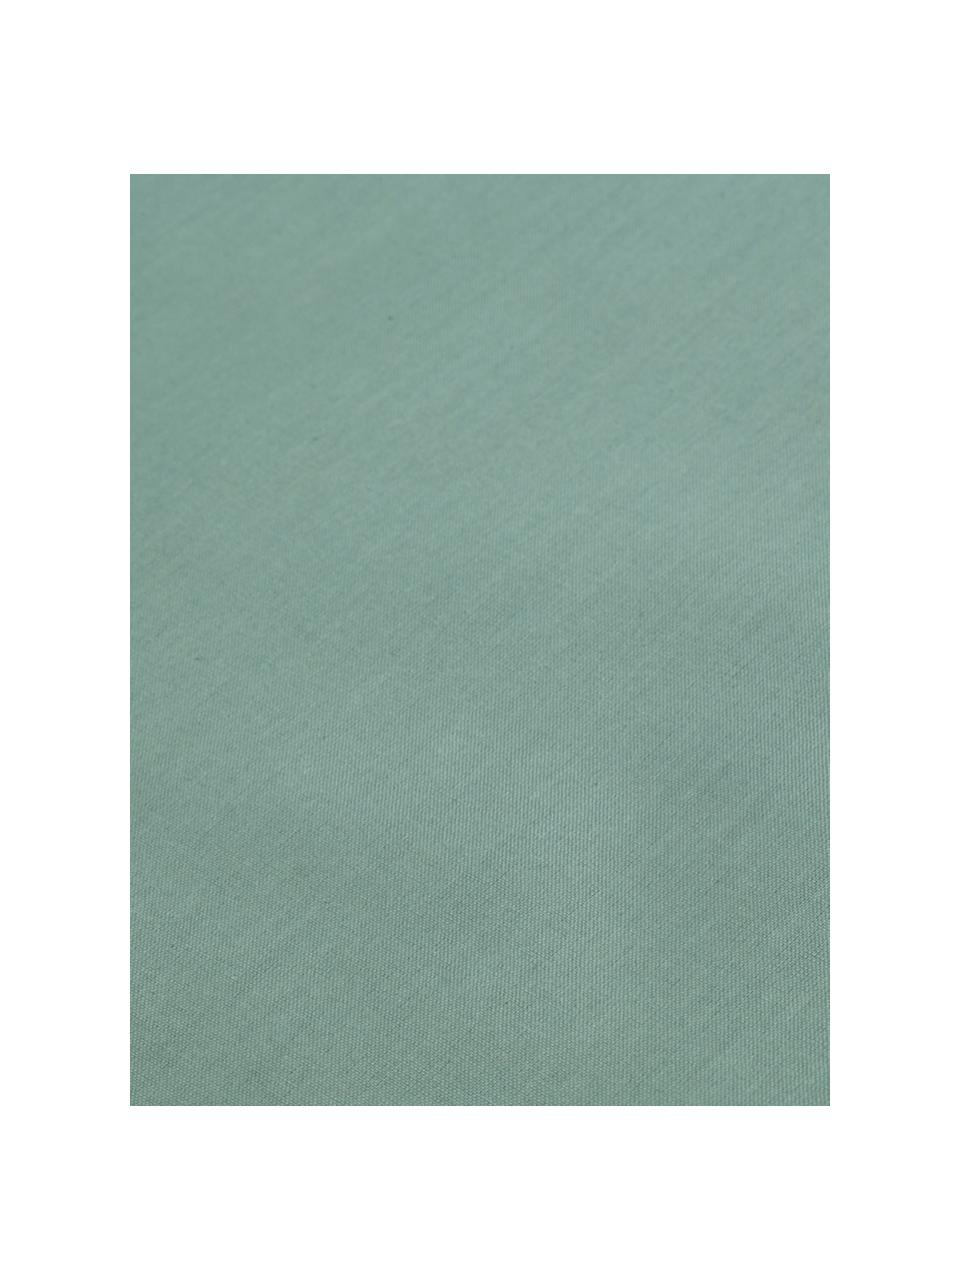 Set lenzuola verde in cotone ranforce Lenare, Fronte e retro: verde reseda, 180 x 290 cm + 1 federa 50 x 80 cm